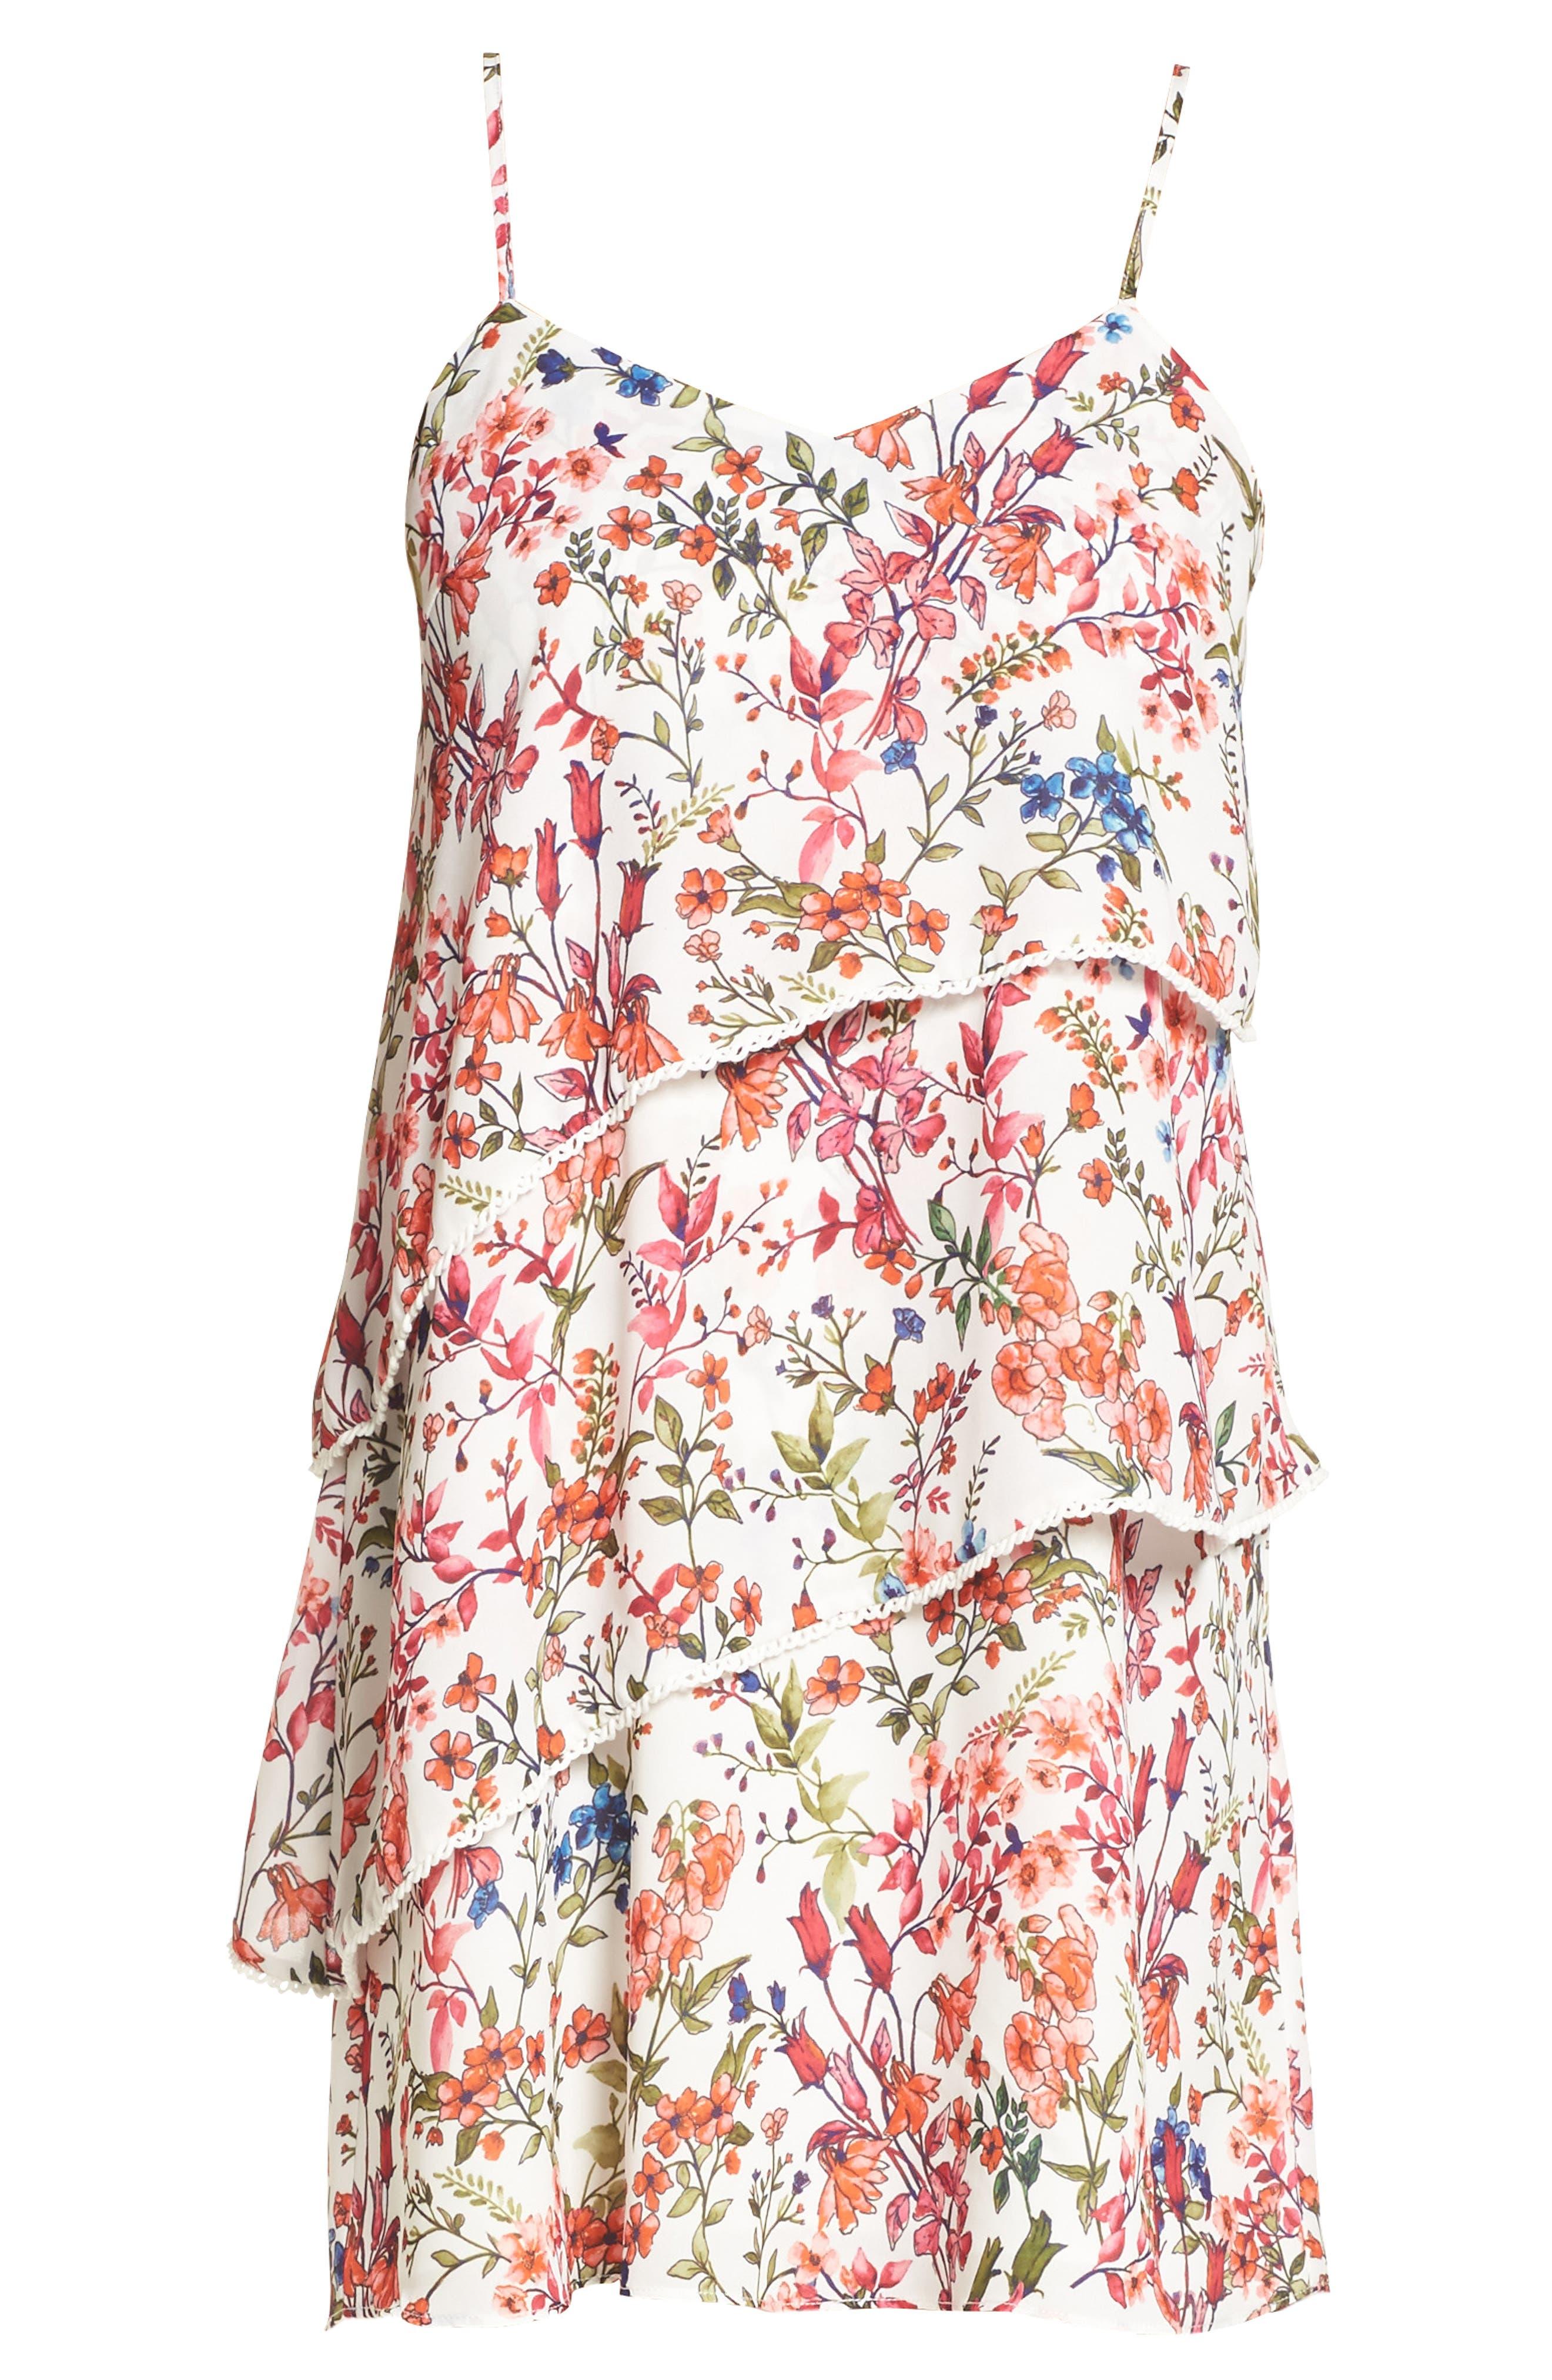 Floral Print Minidress,                             Alternate thumbnail 6, color,                             152